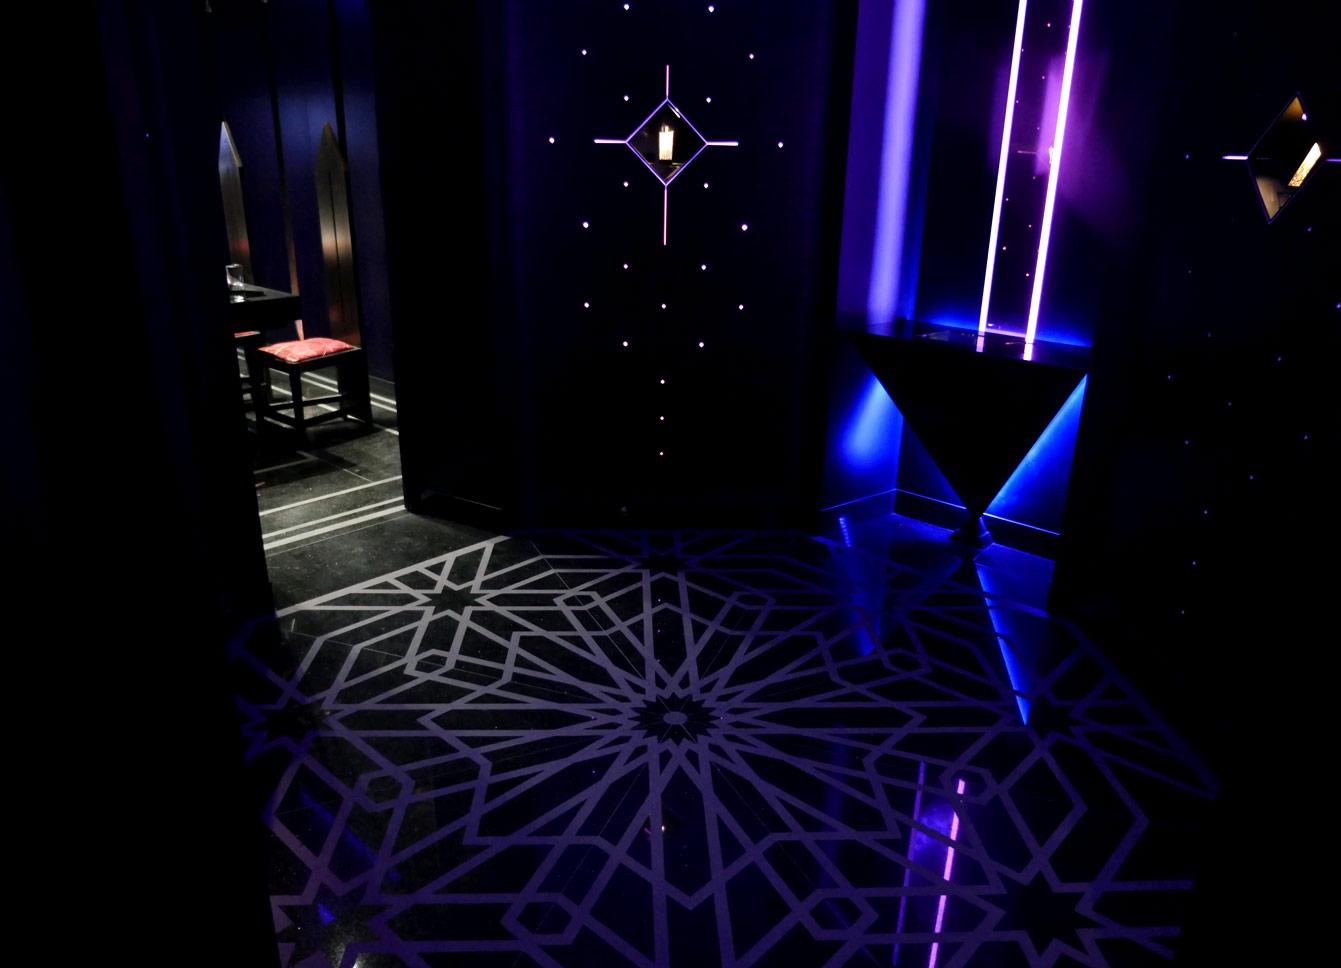 serge-lutens-espace-palais-royal-01